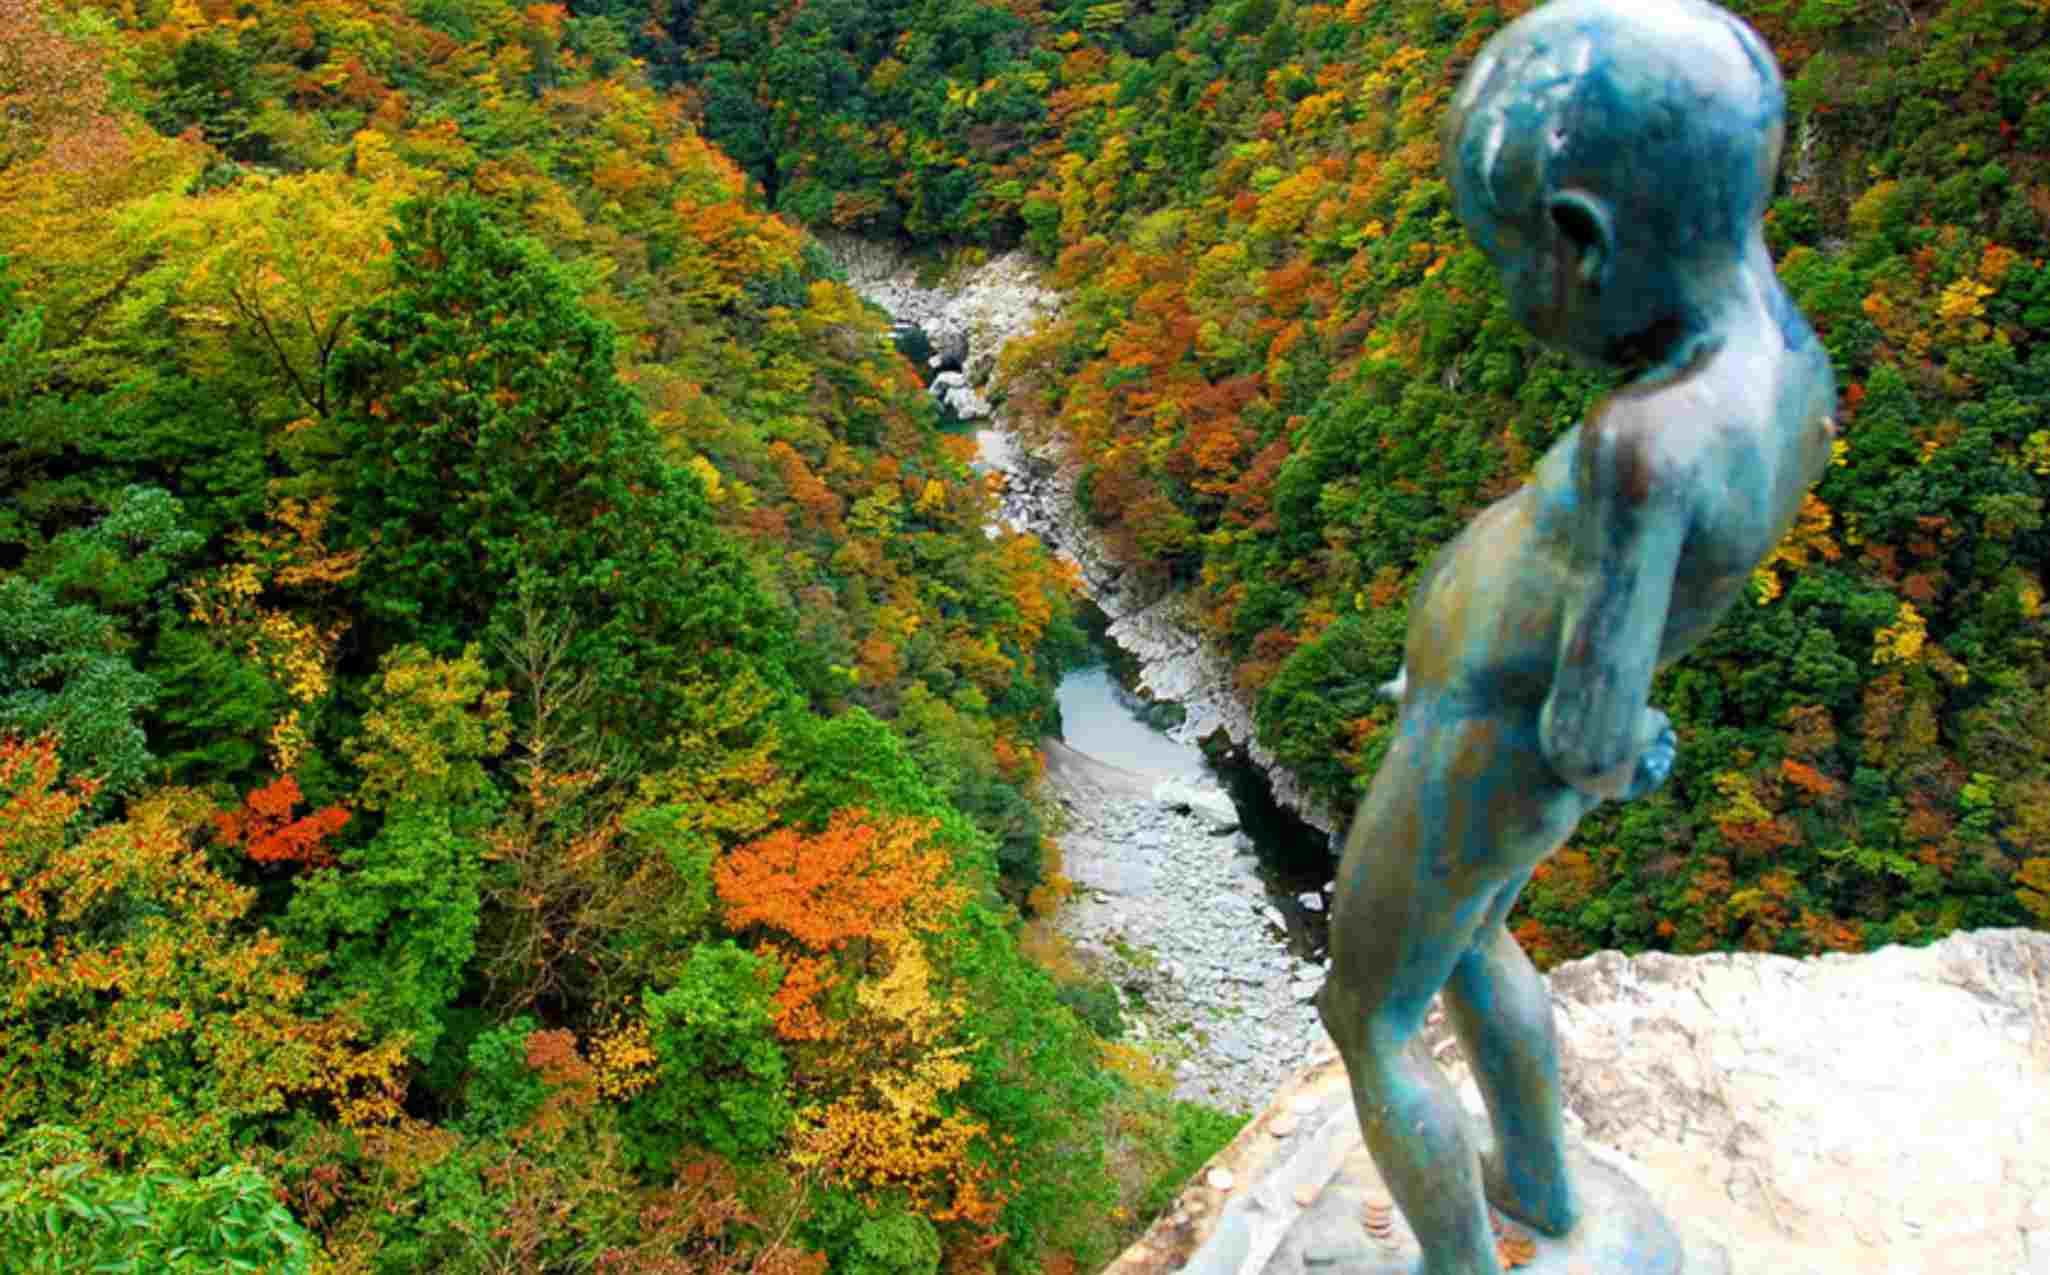 Iya Valley Peeing Boy Statue